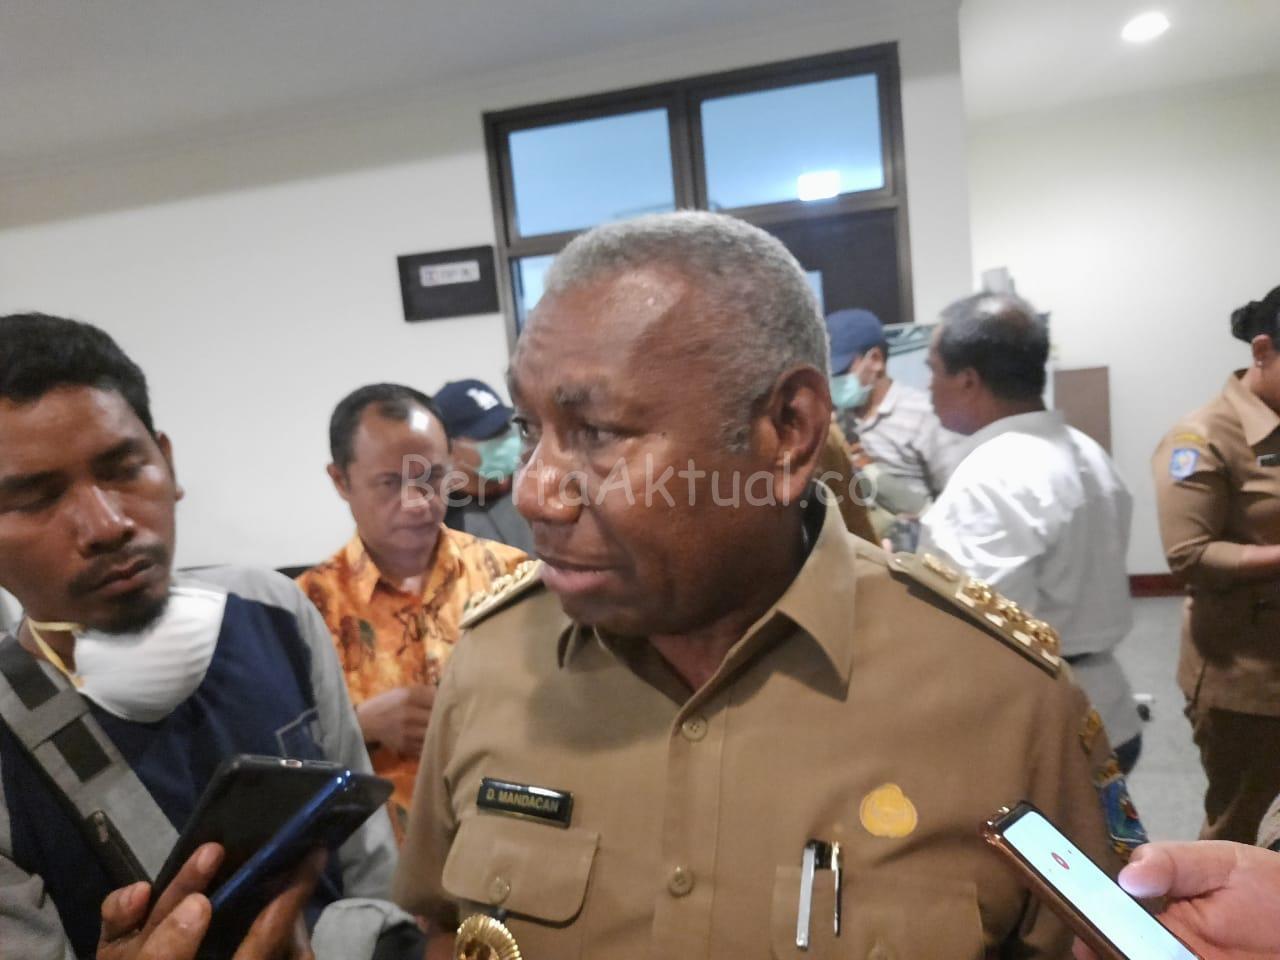 Gubernur: Jika Papua Barat Lockdown Perekonomian Akan Goyah 4 IMG 20200325 WA0004